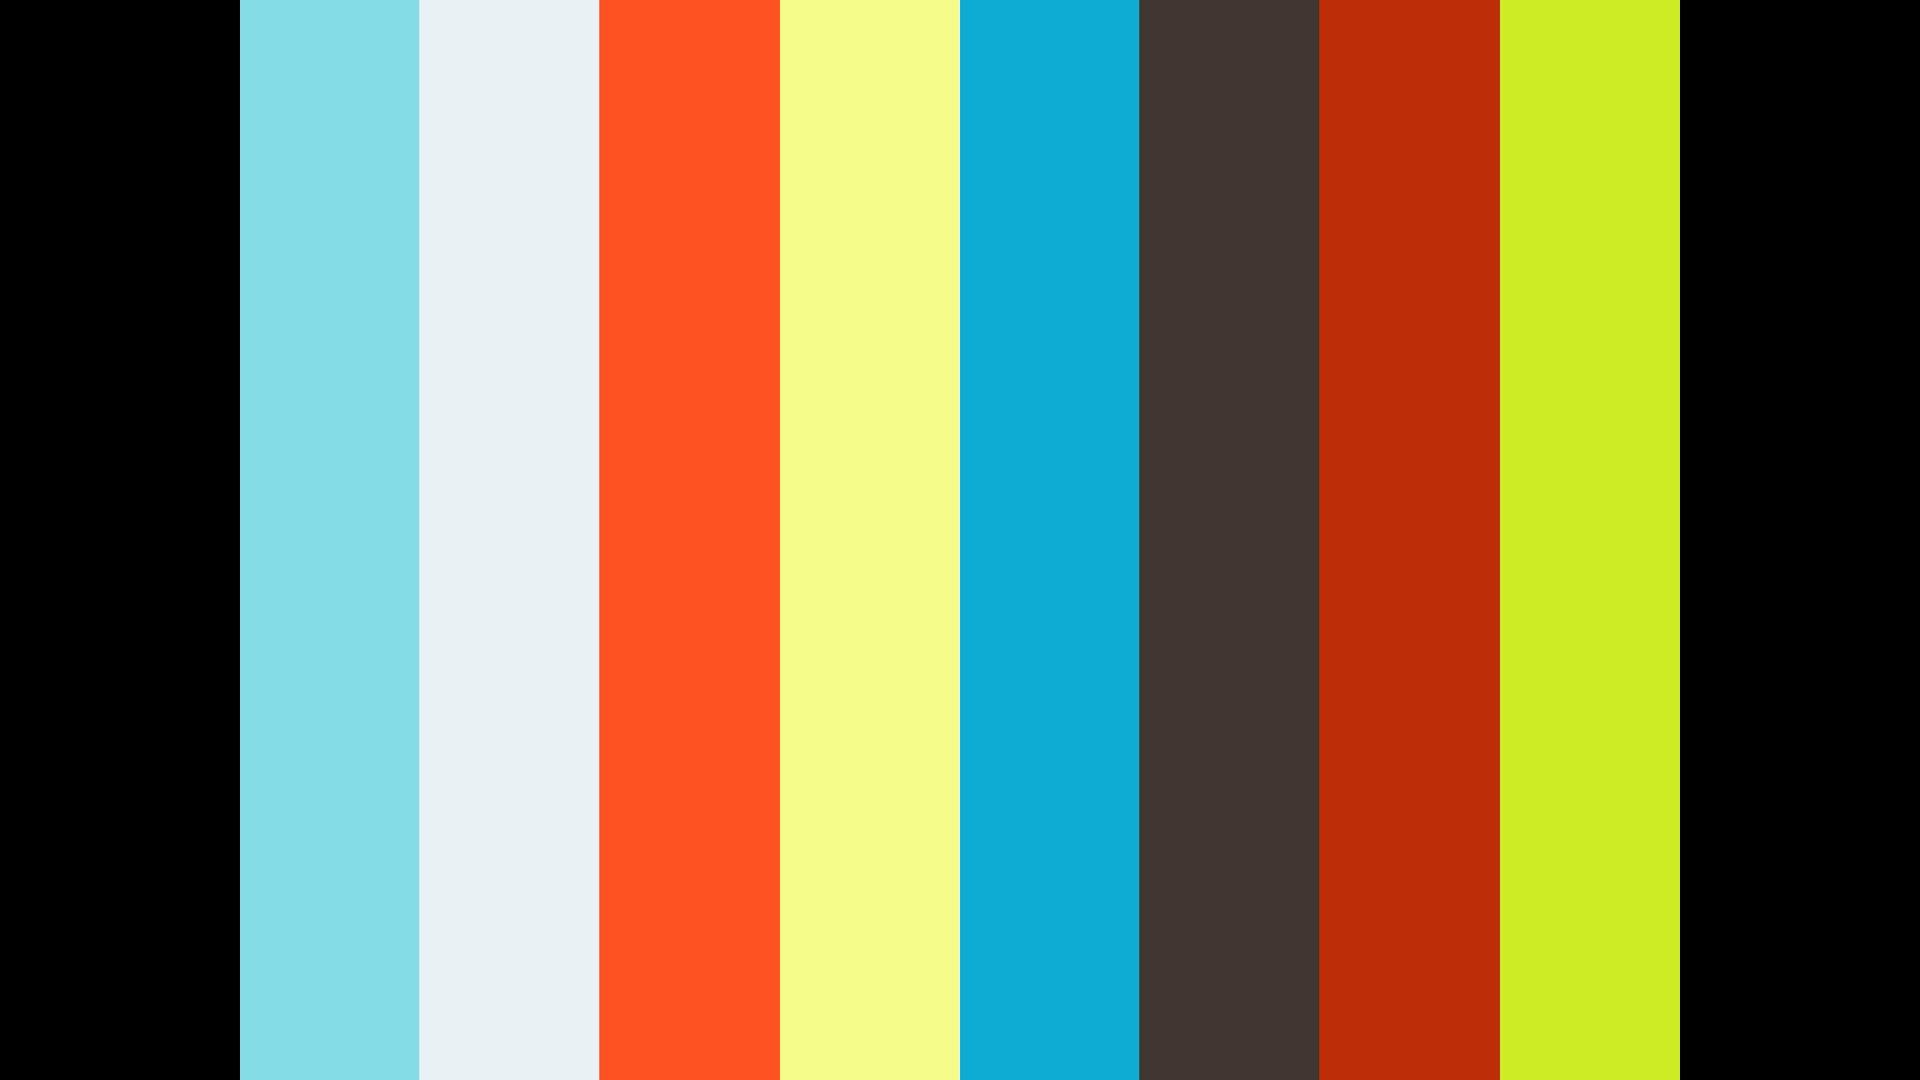 Demostrative pronouns, colors and shapes